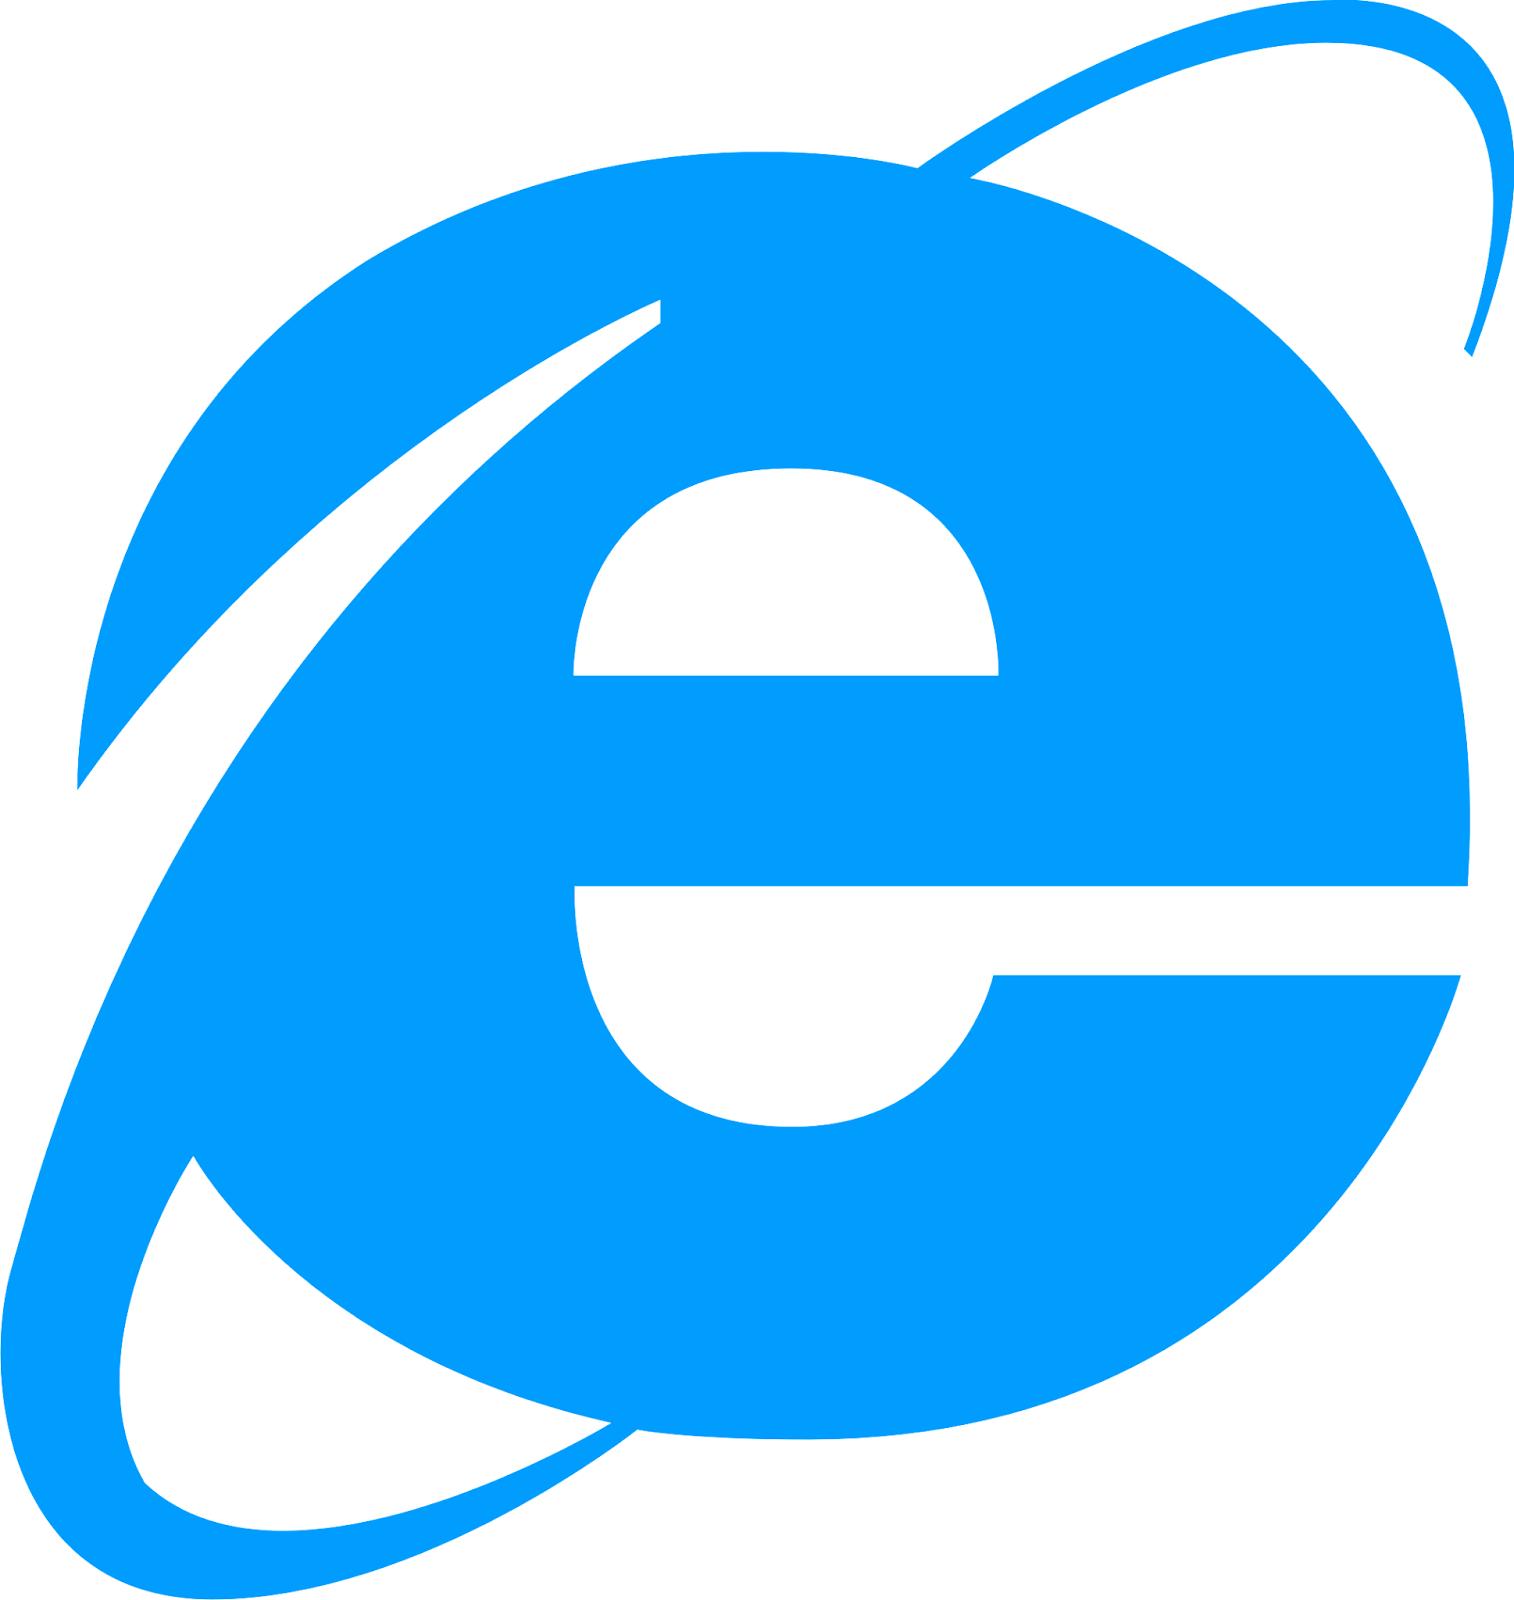 Spartan por Internet Explorer